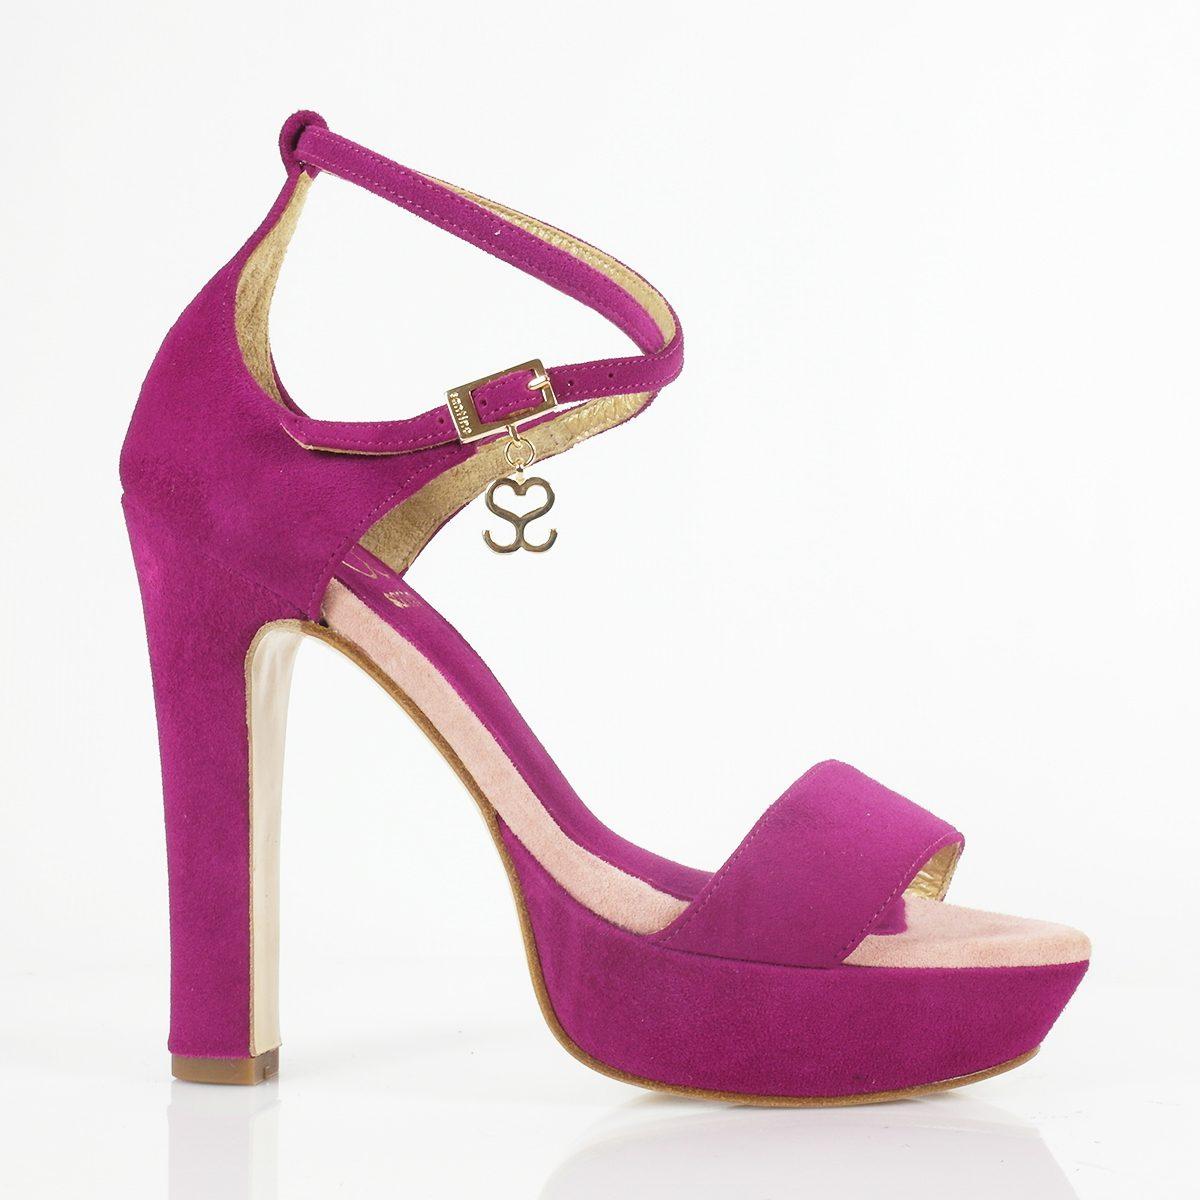 SANDALIA MOD.1378 (12,5cm) - zapatos personalizados fiesta